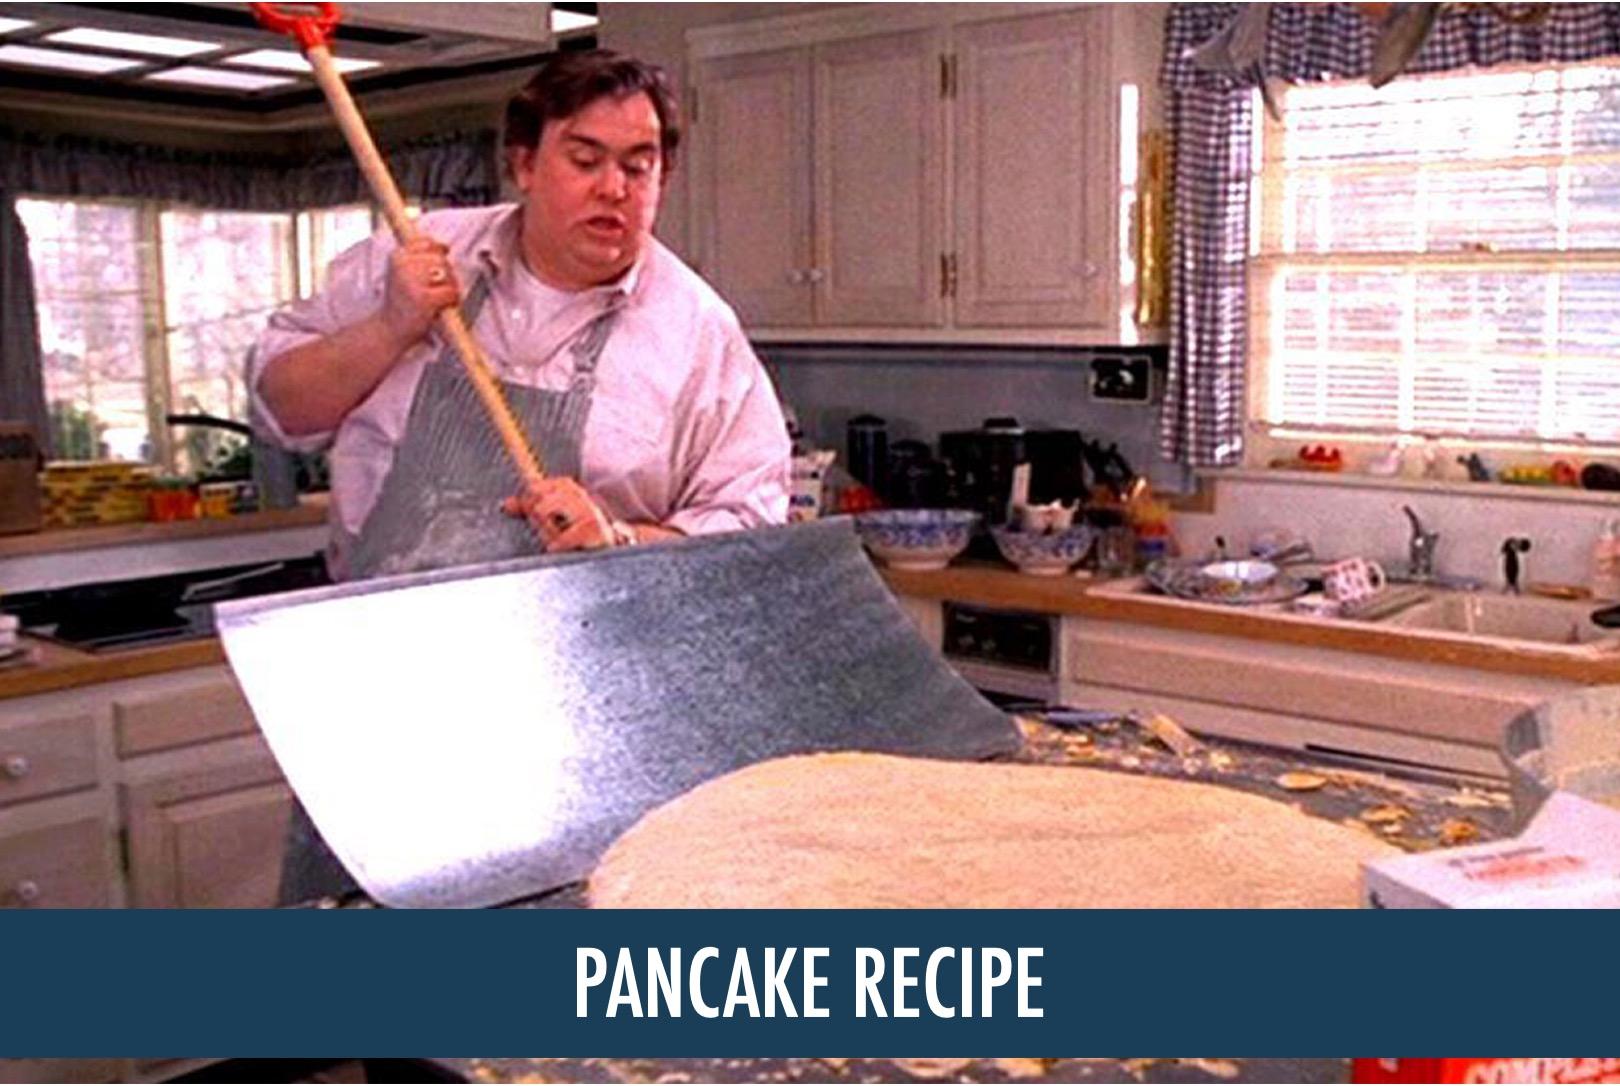 Make today Pan-tastic!